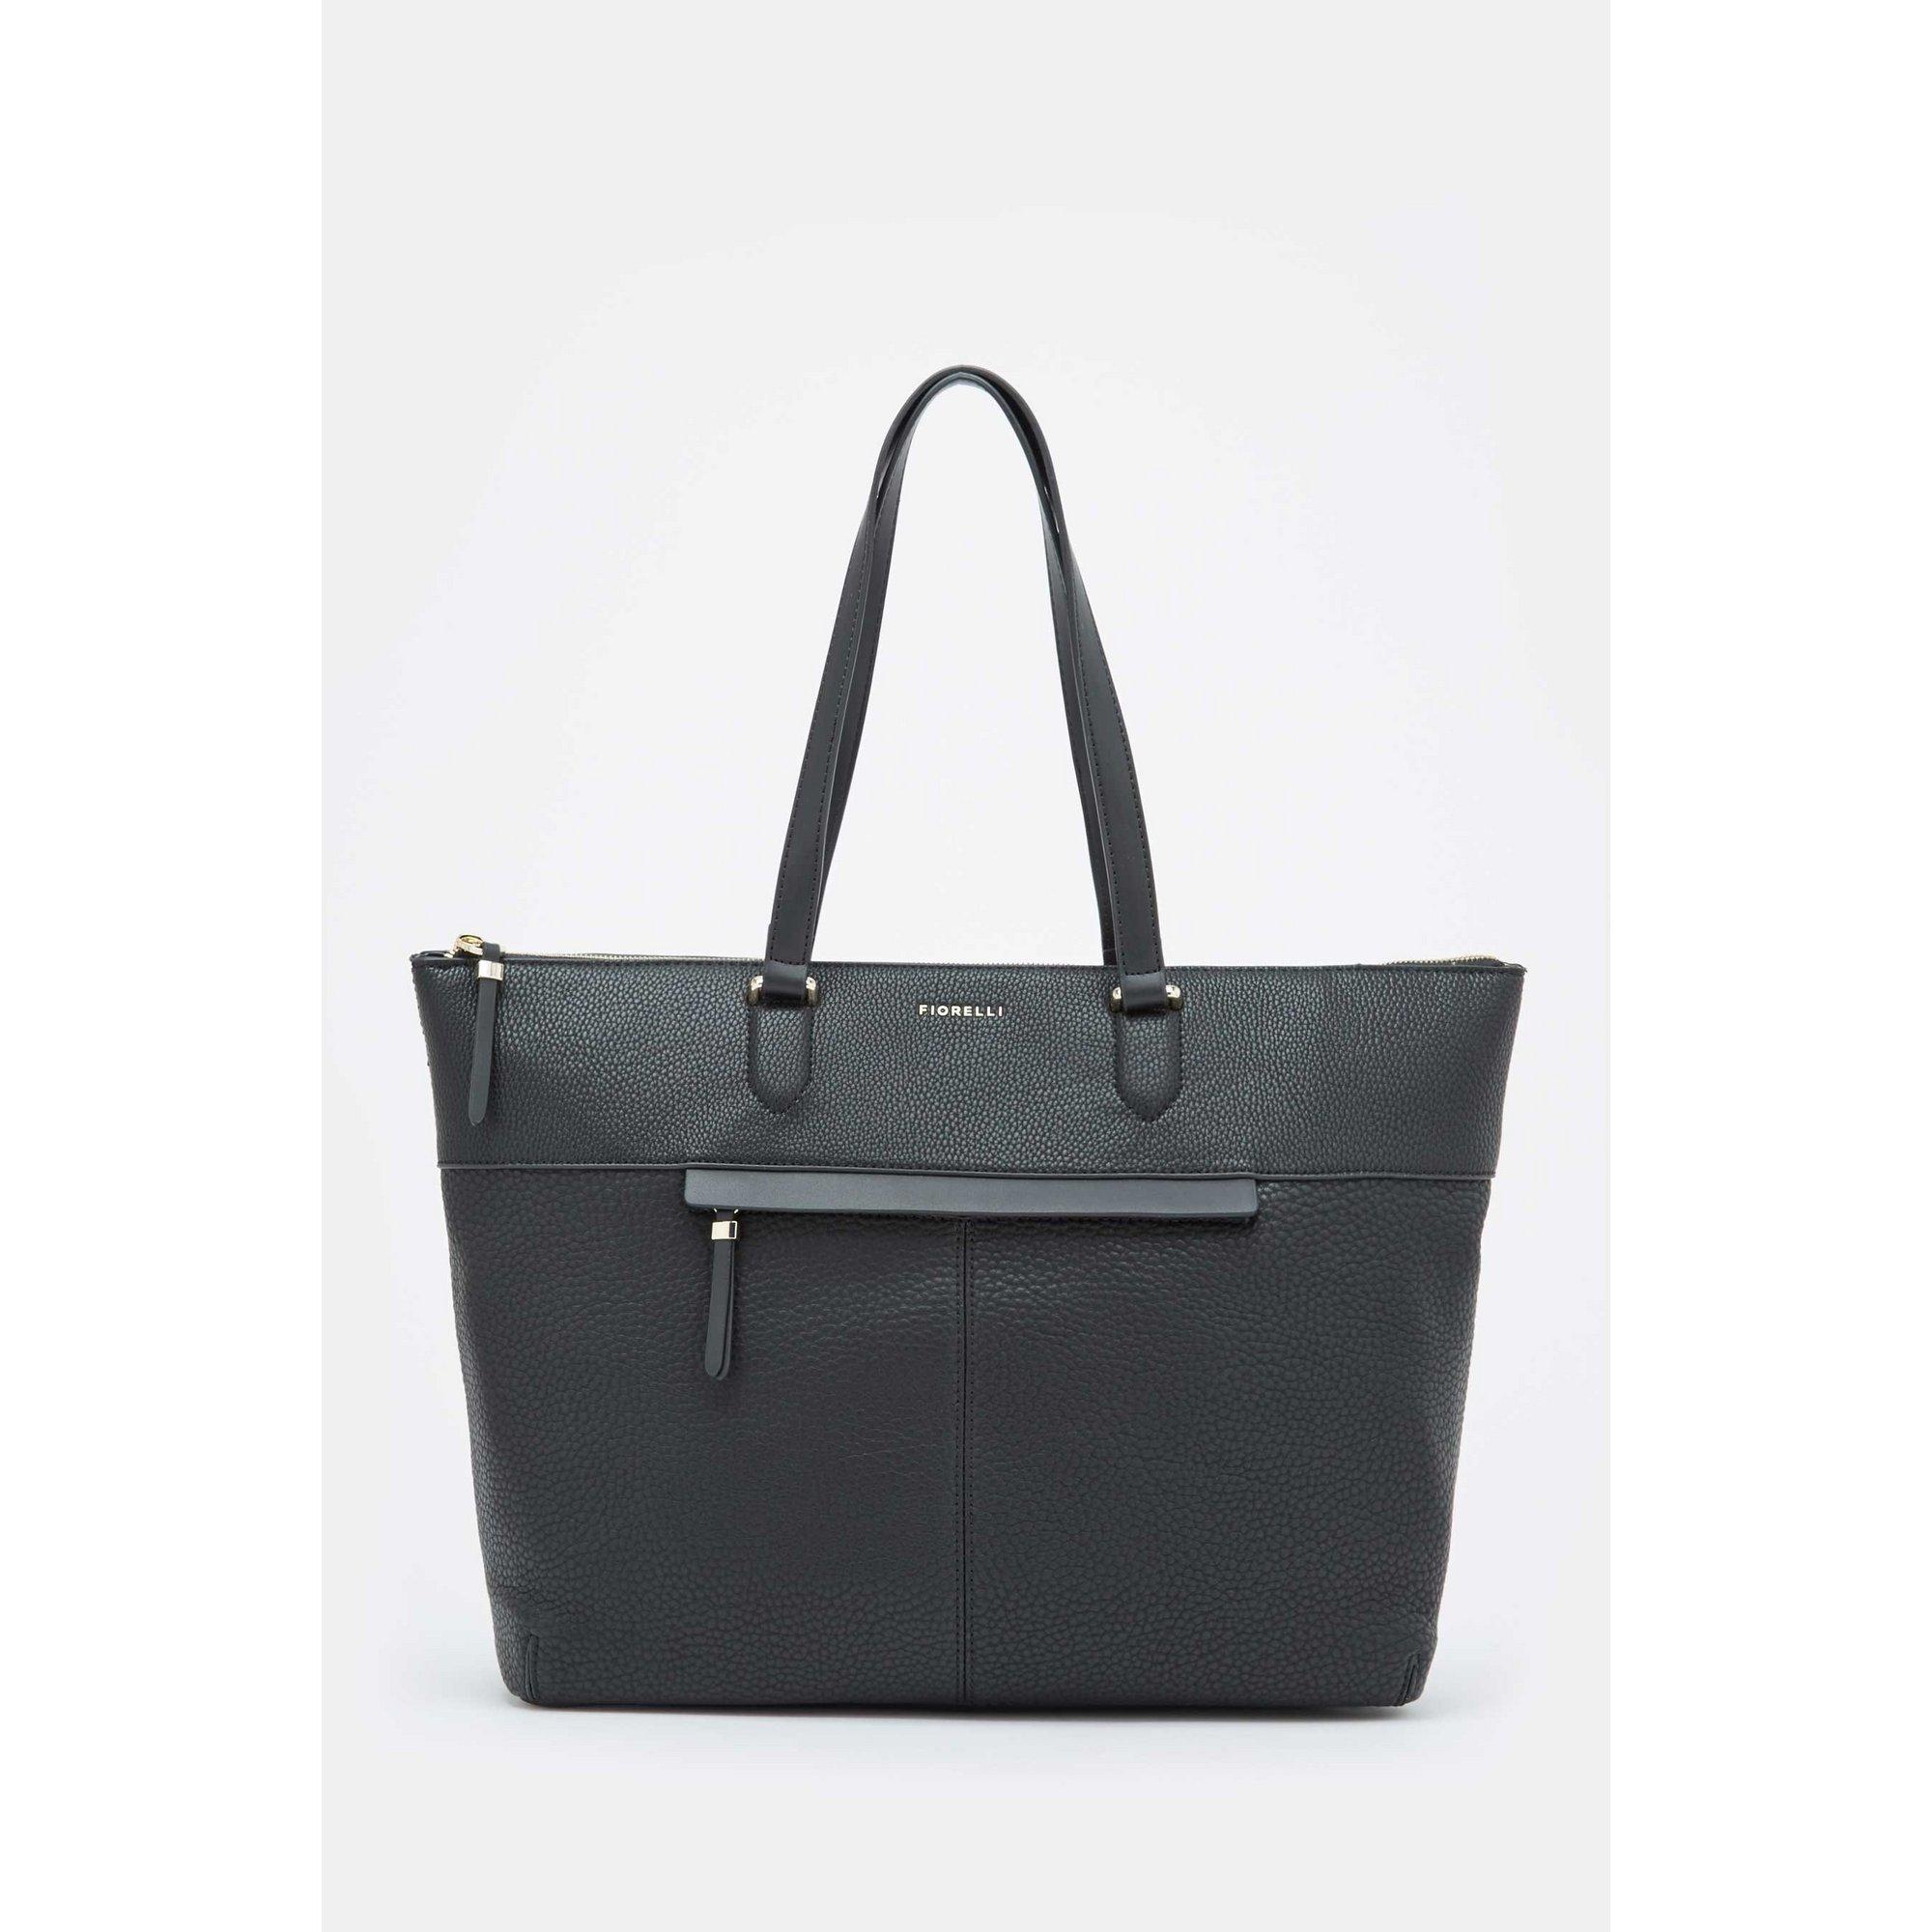 Image of Black Fiorelli Chelsea Tote Bag